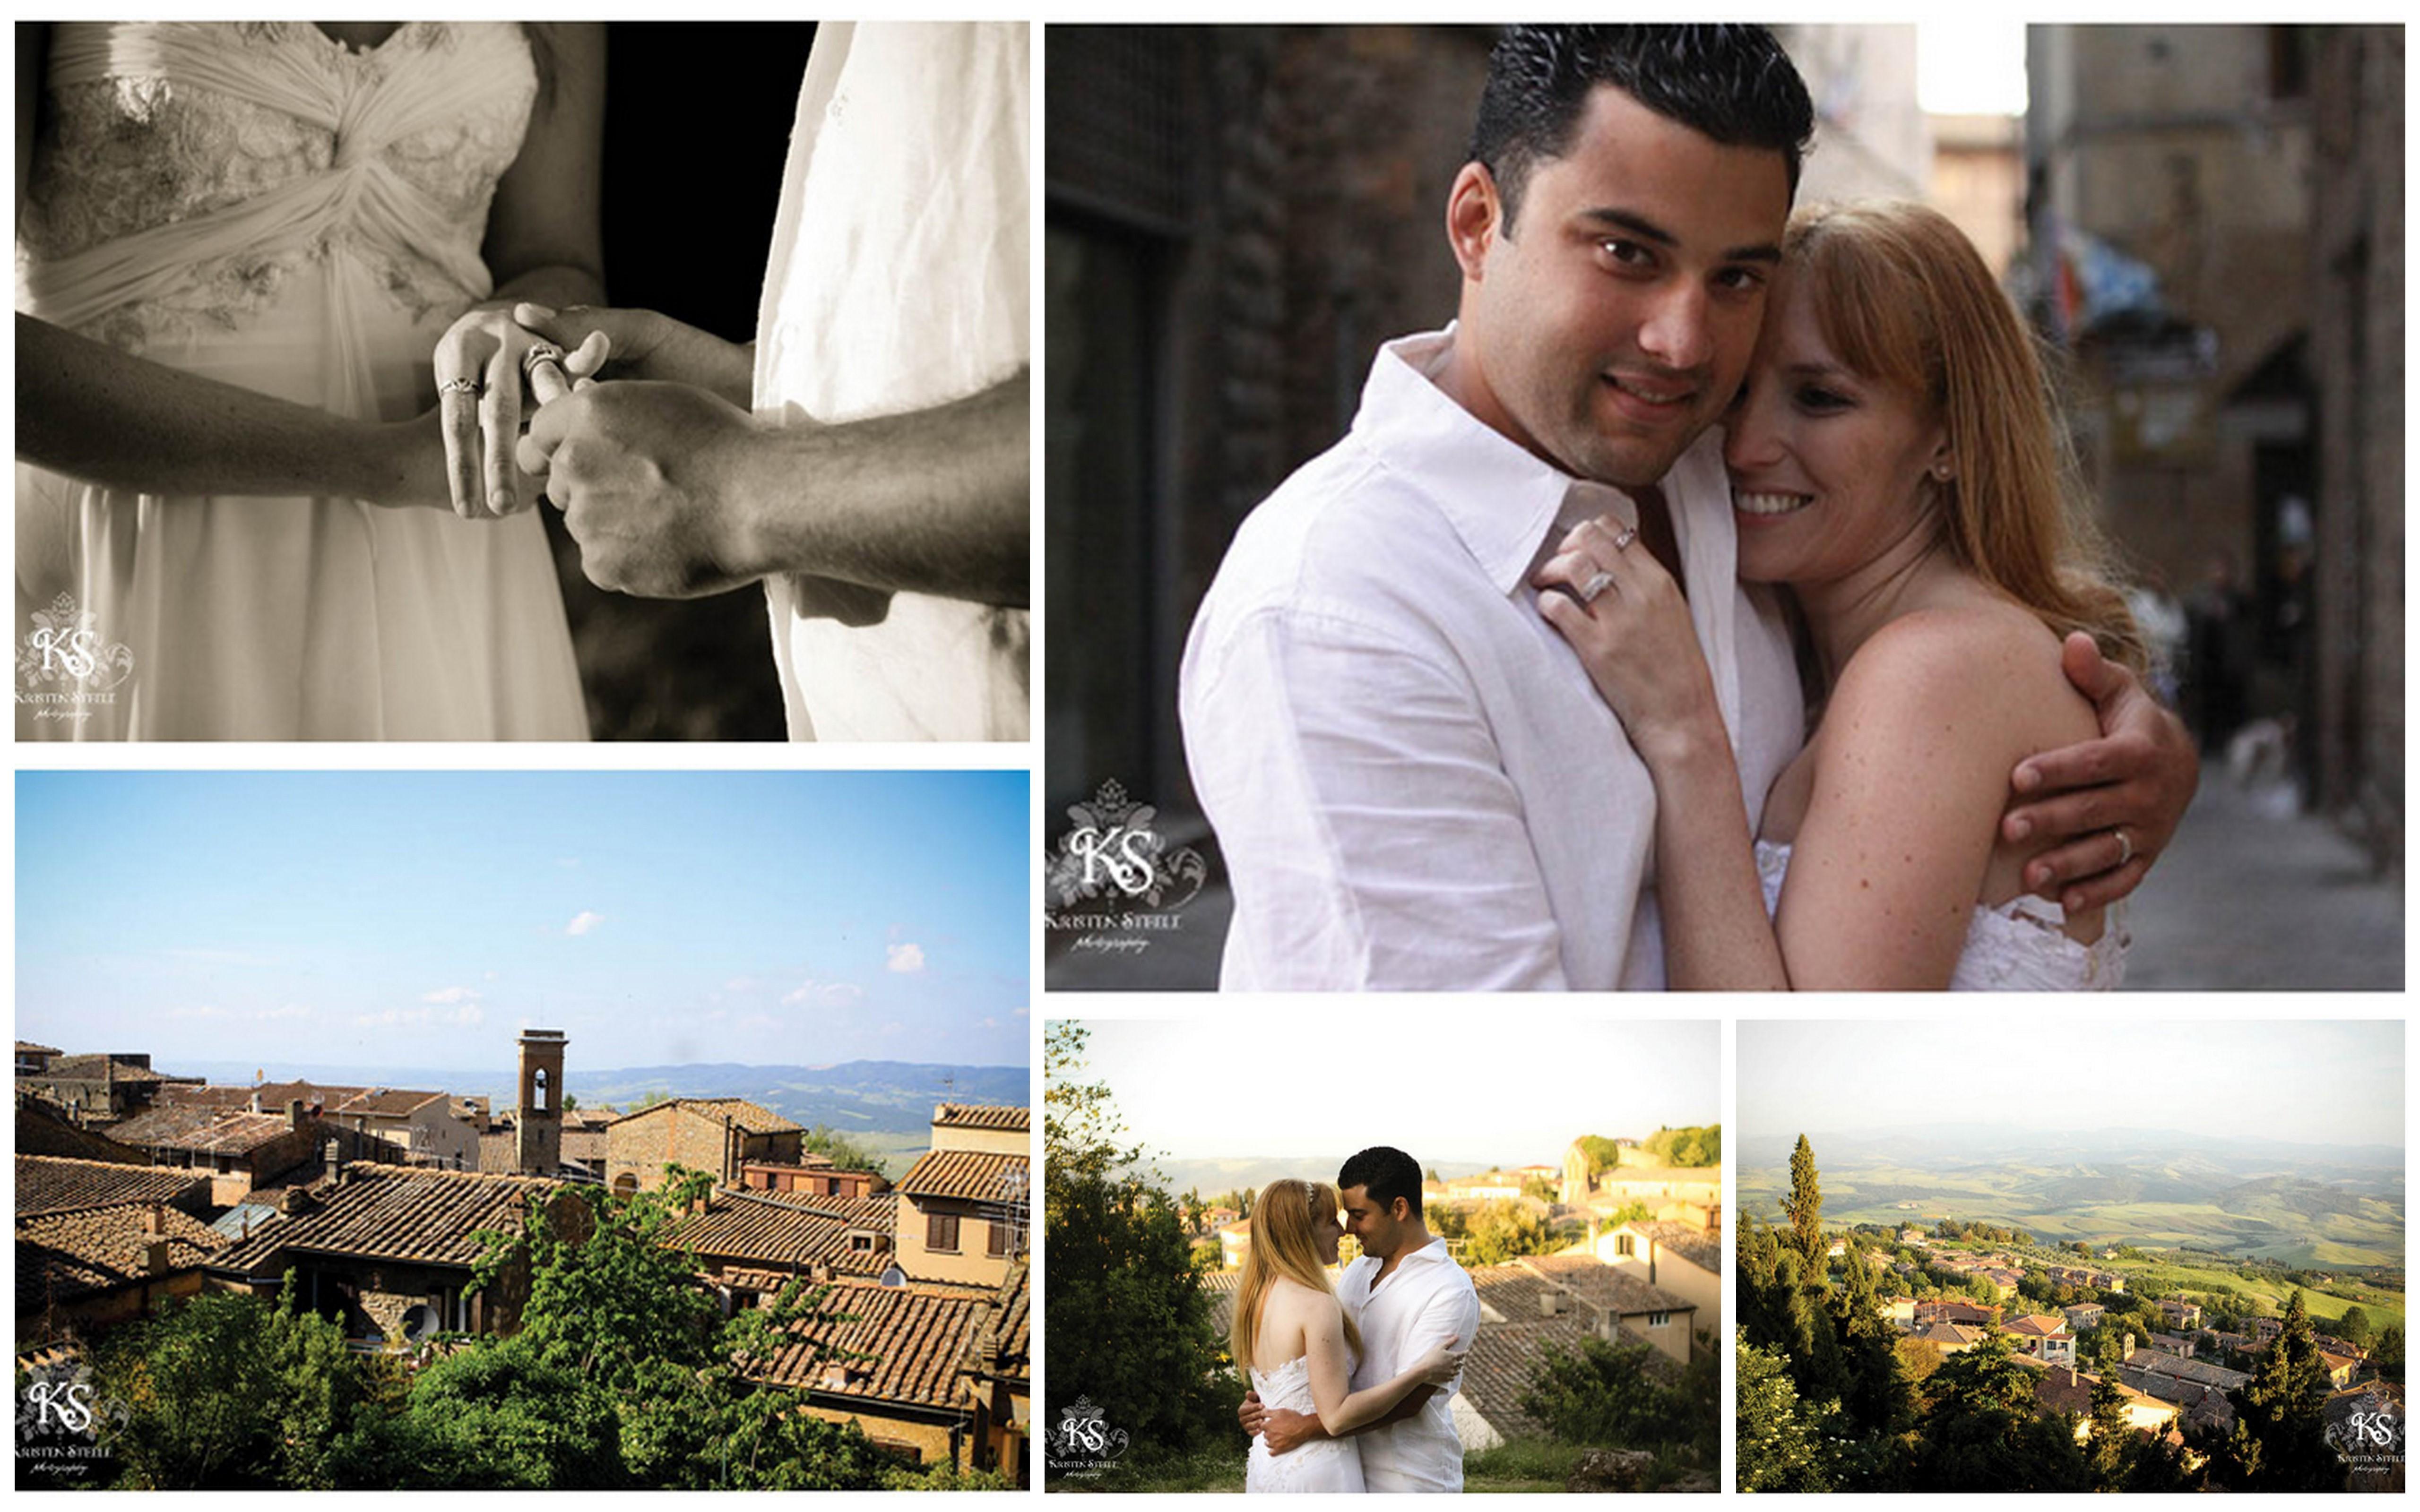 Nashville Wedding Vendor, Photography, Italian Wedding, Destination Wedding, Wedding 101